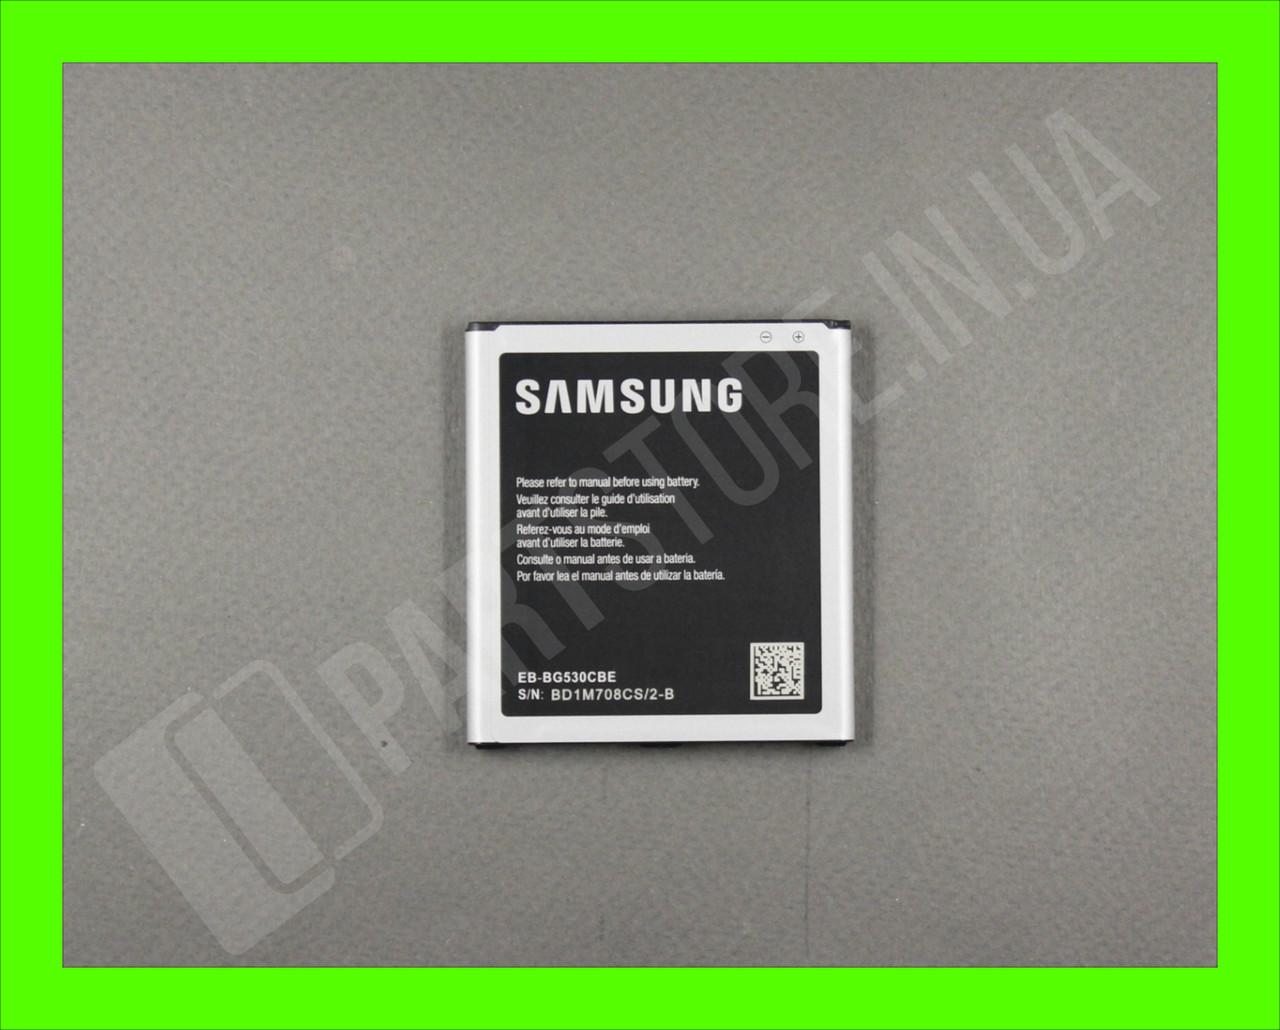 Аккумулятор Samsung j250 j2 2018 (EB-BG530CBE) GH43-04372A сервисный оригинал